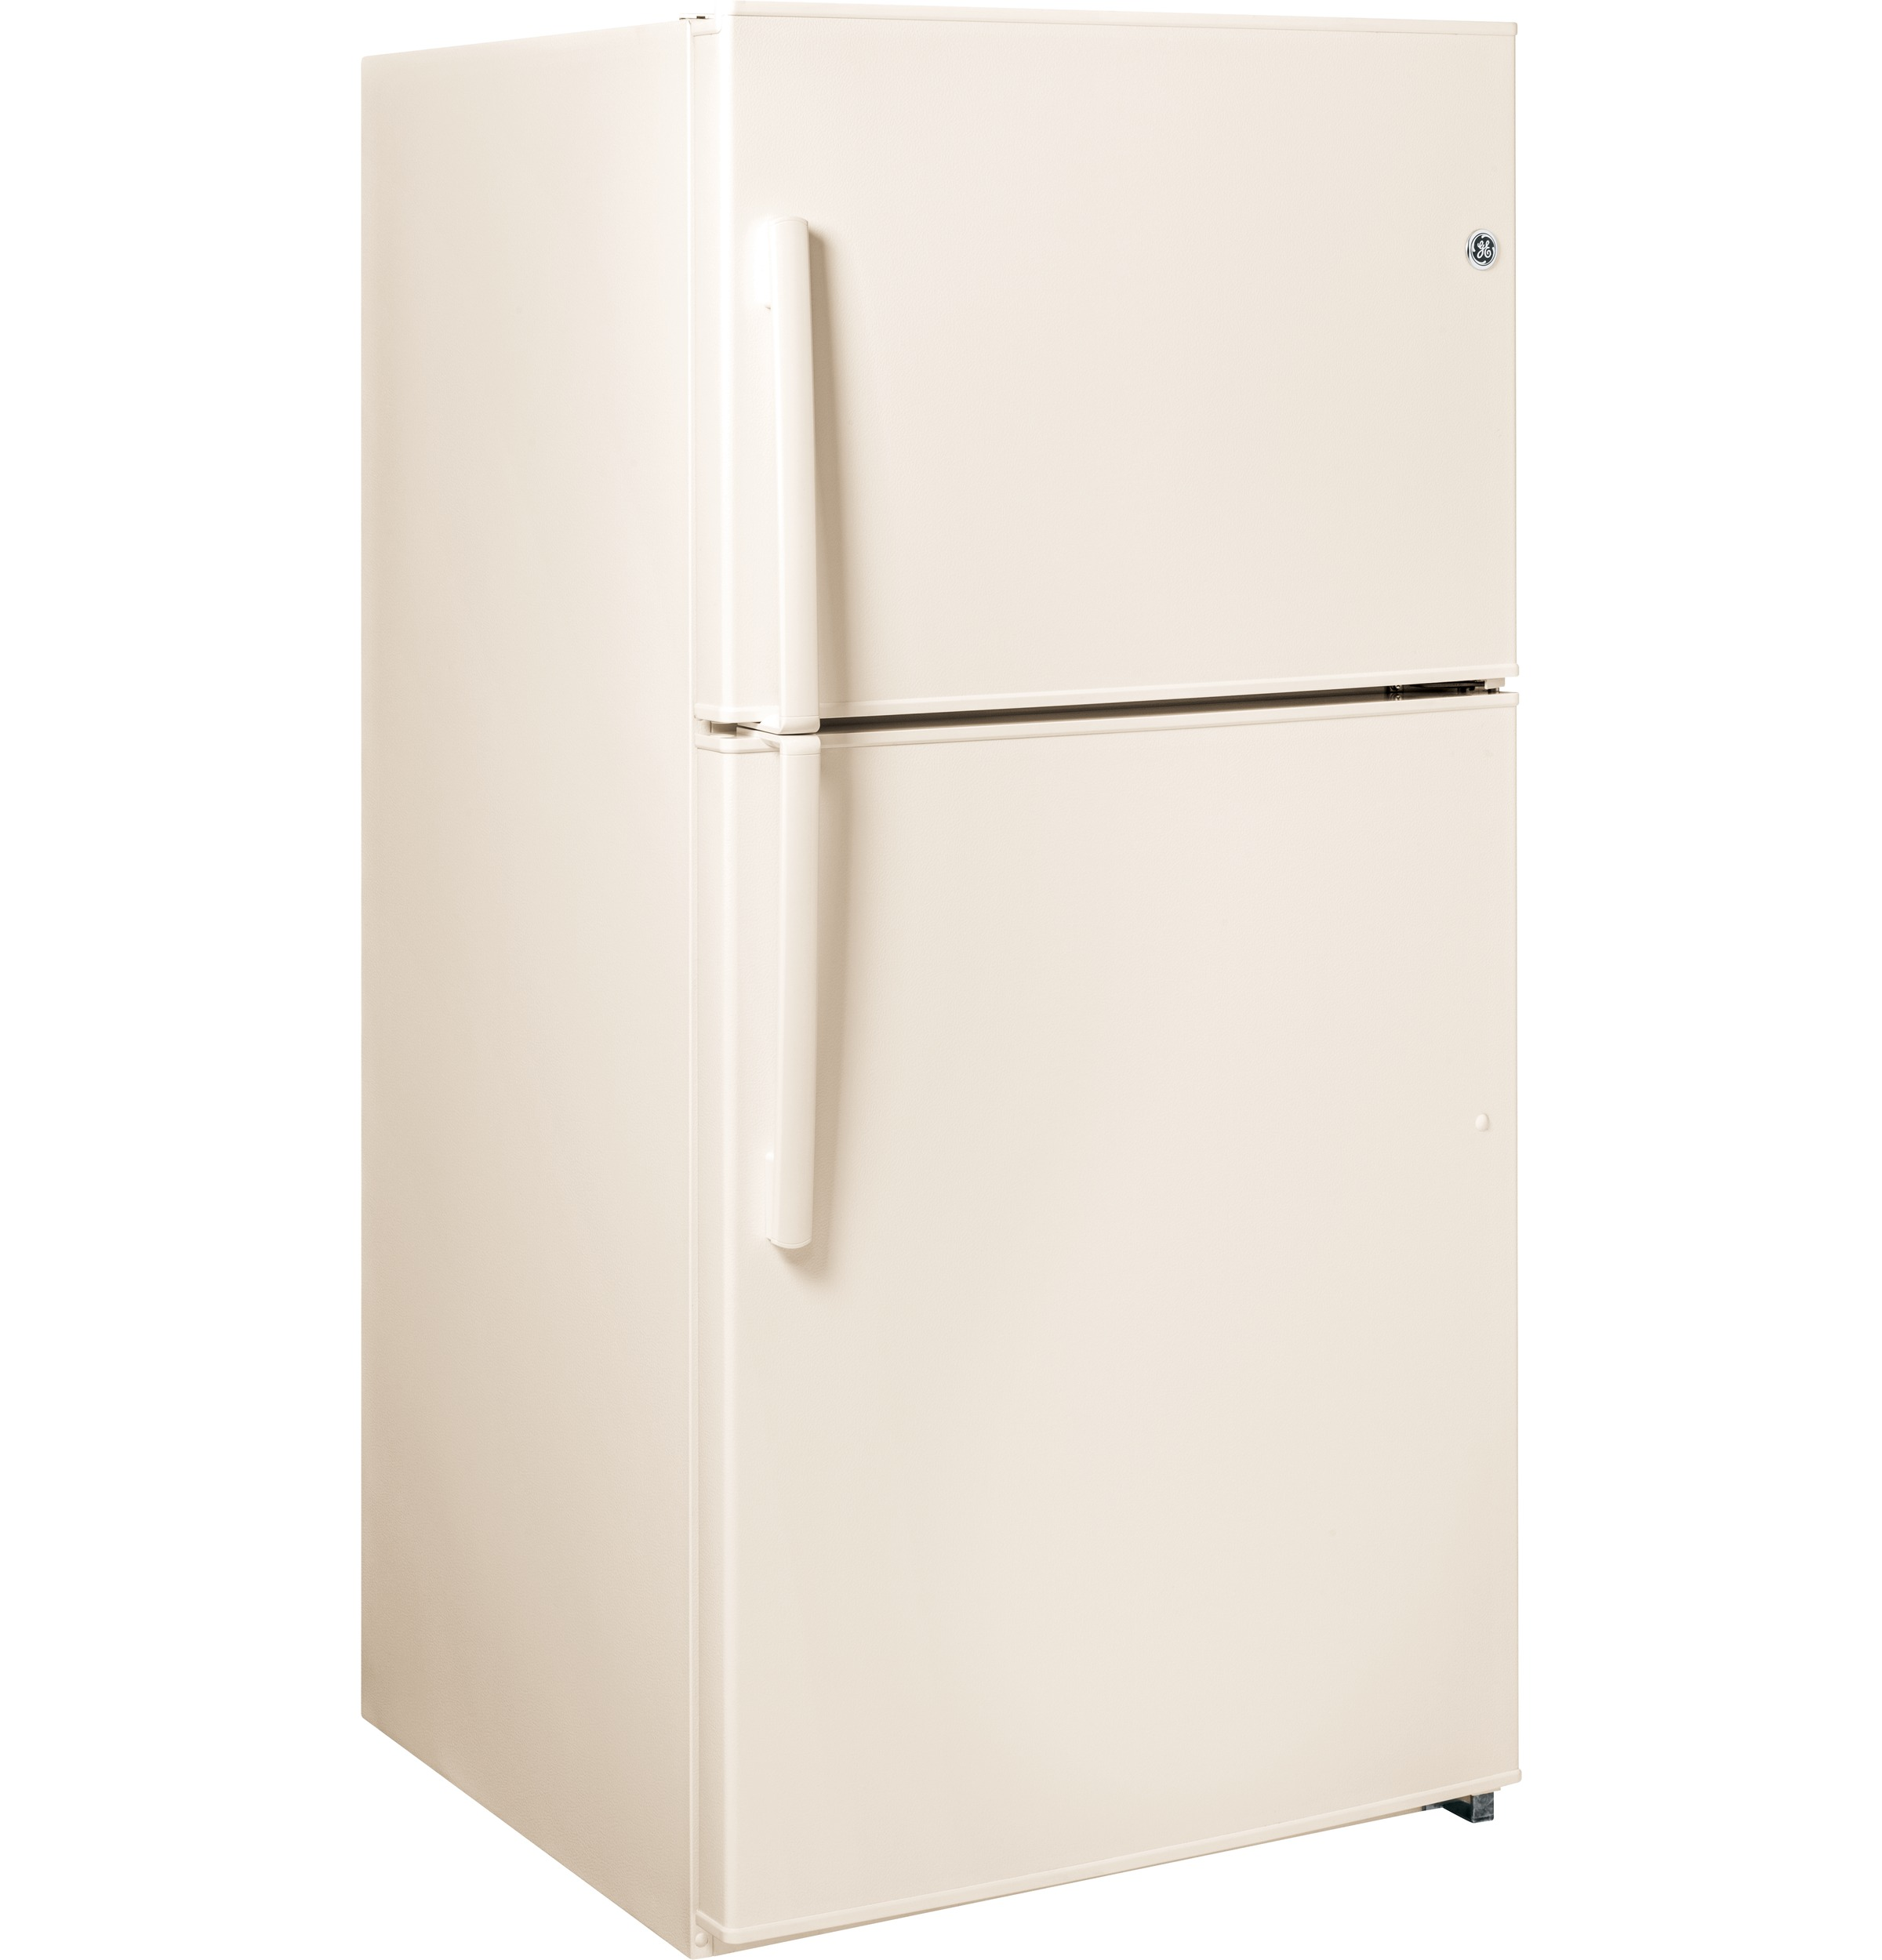 GE Appliances 21.2 cu. ft. Top-Freezer Refrigerator - Bisque